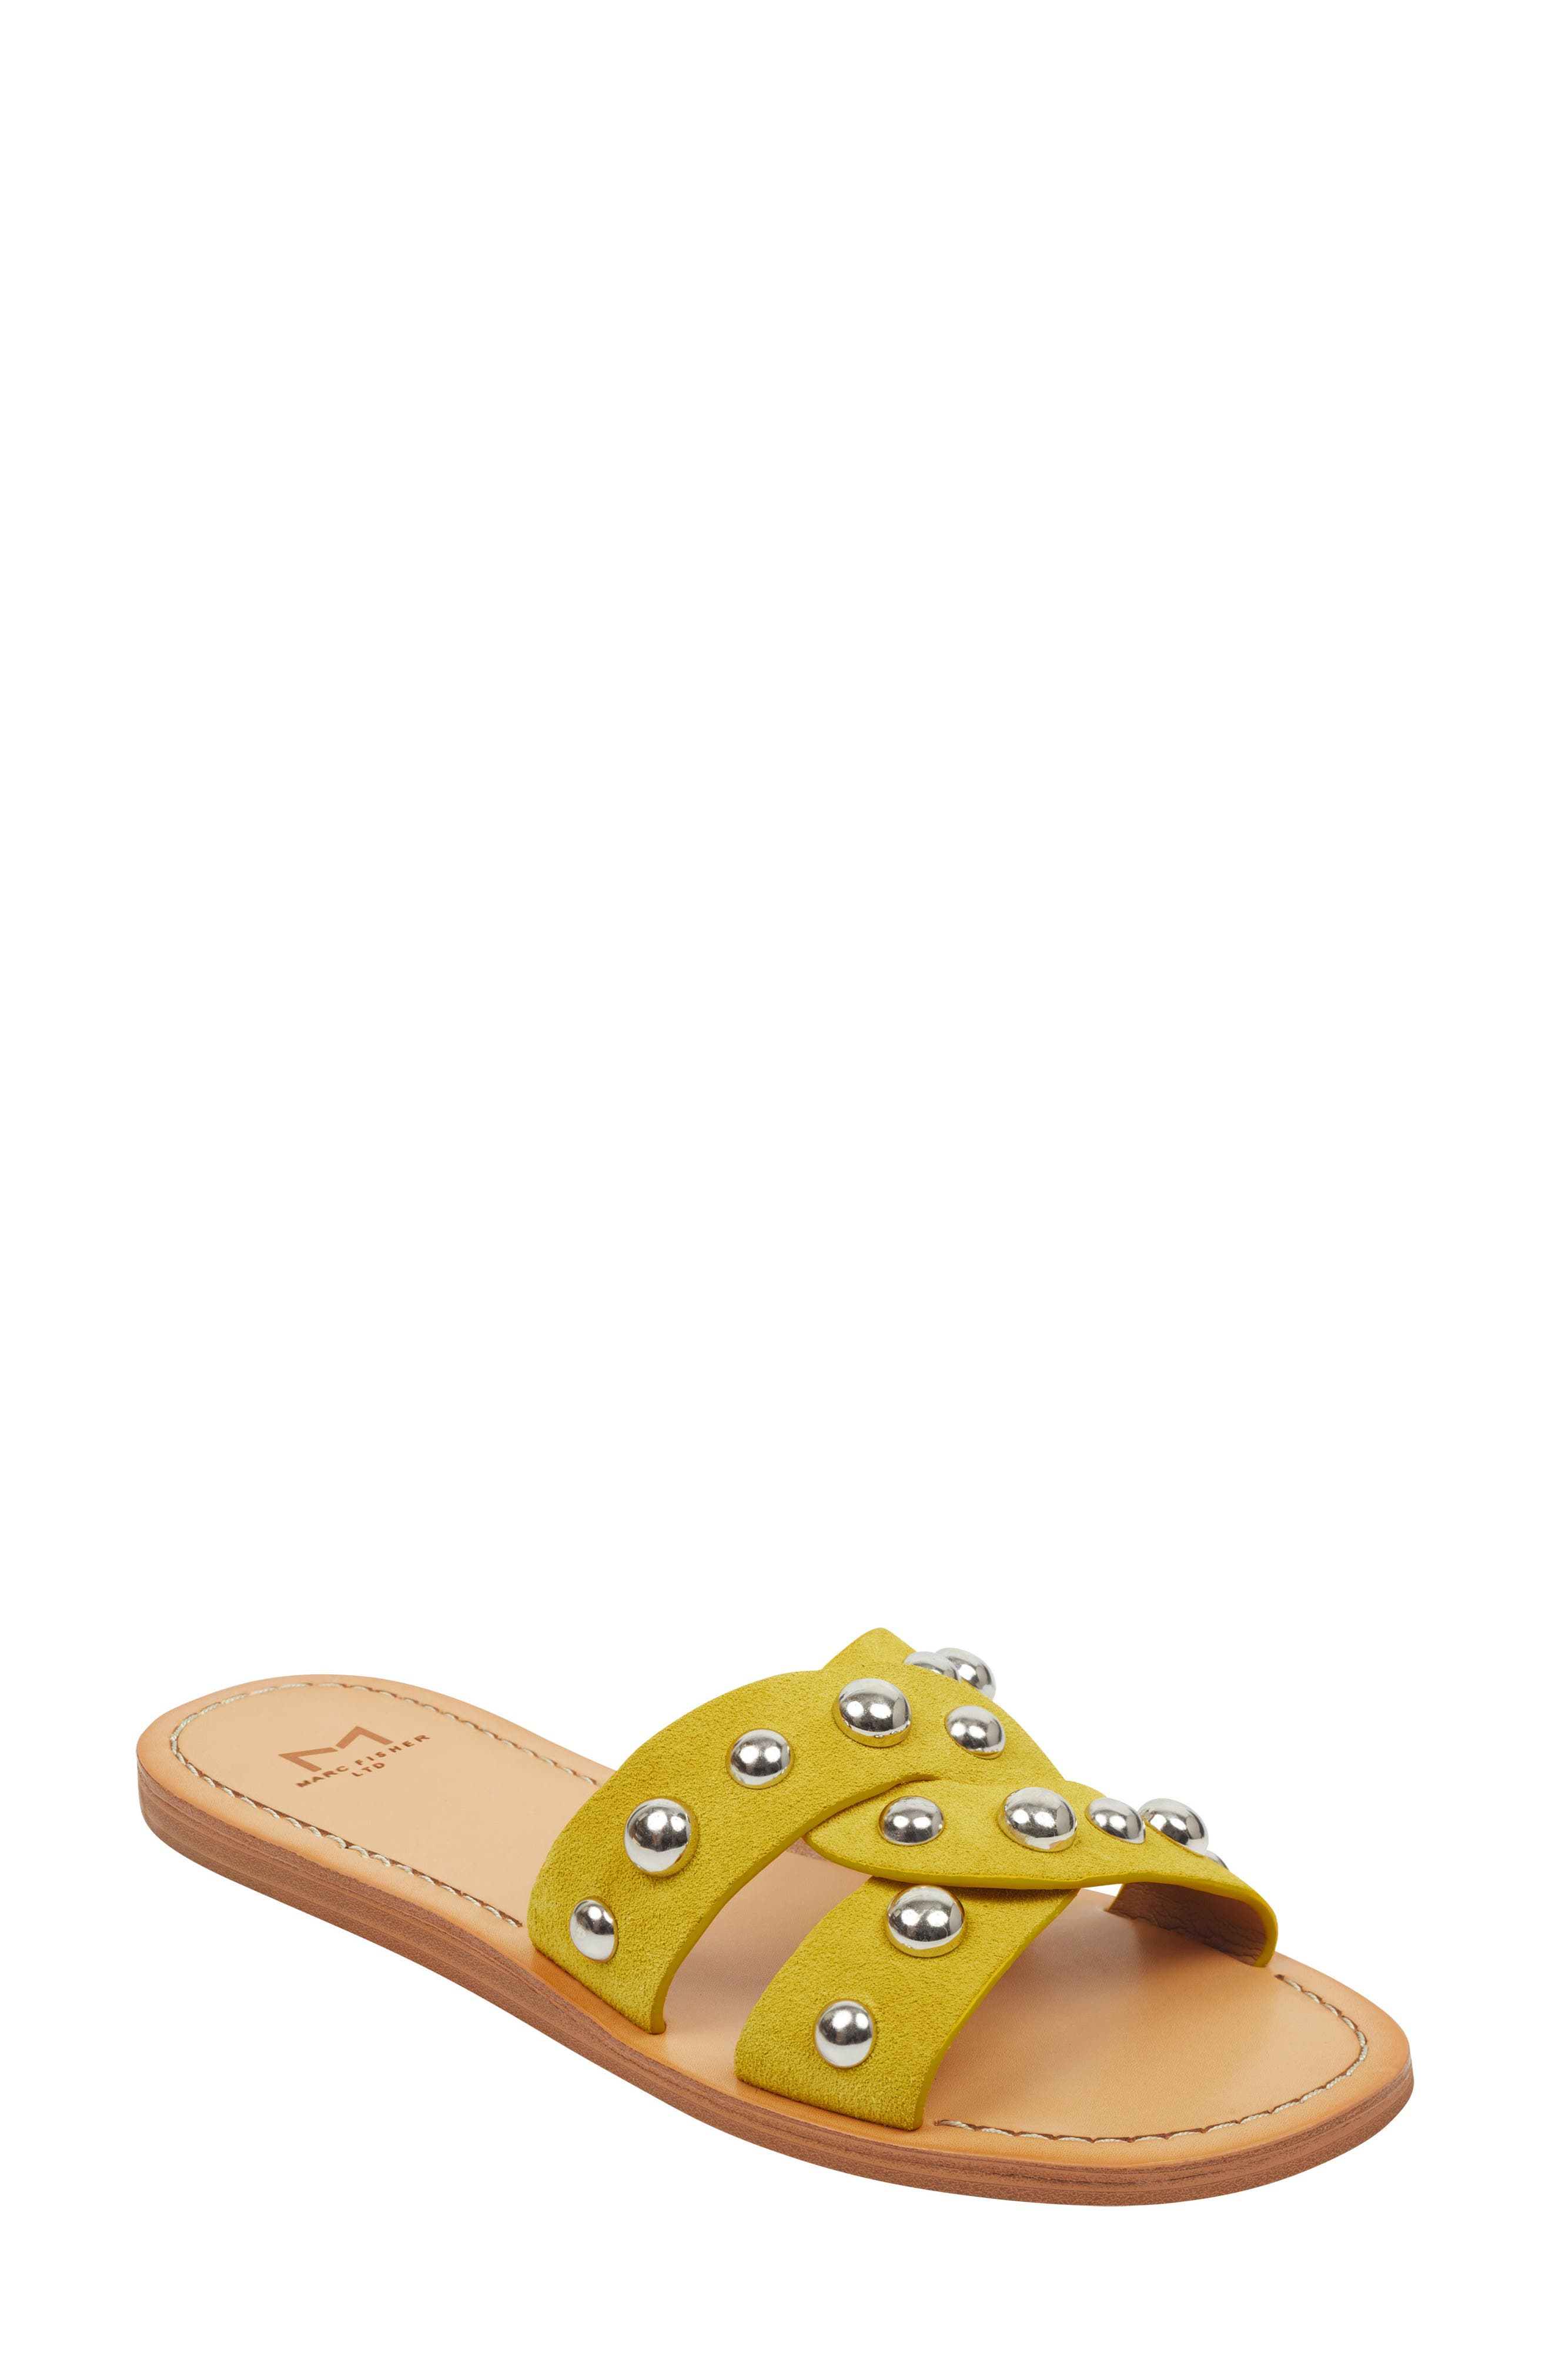 MARC FISHER LTD Pagie Slide Sandal, Main, color, YELLOW SUEDE